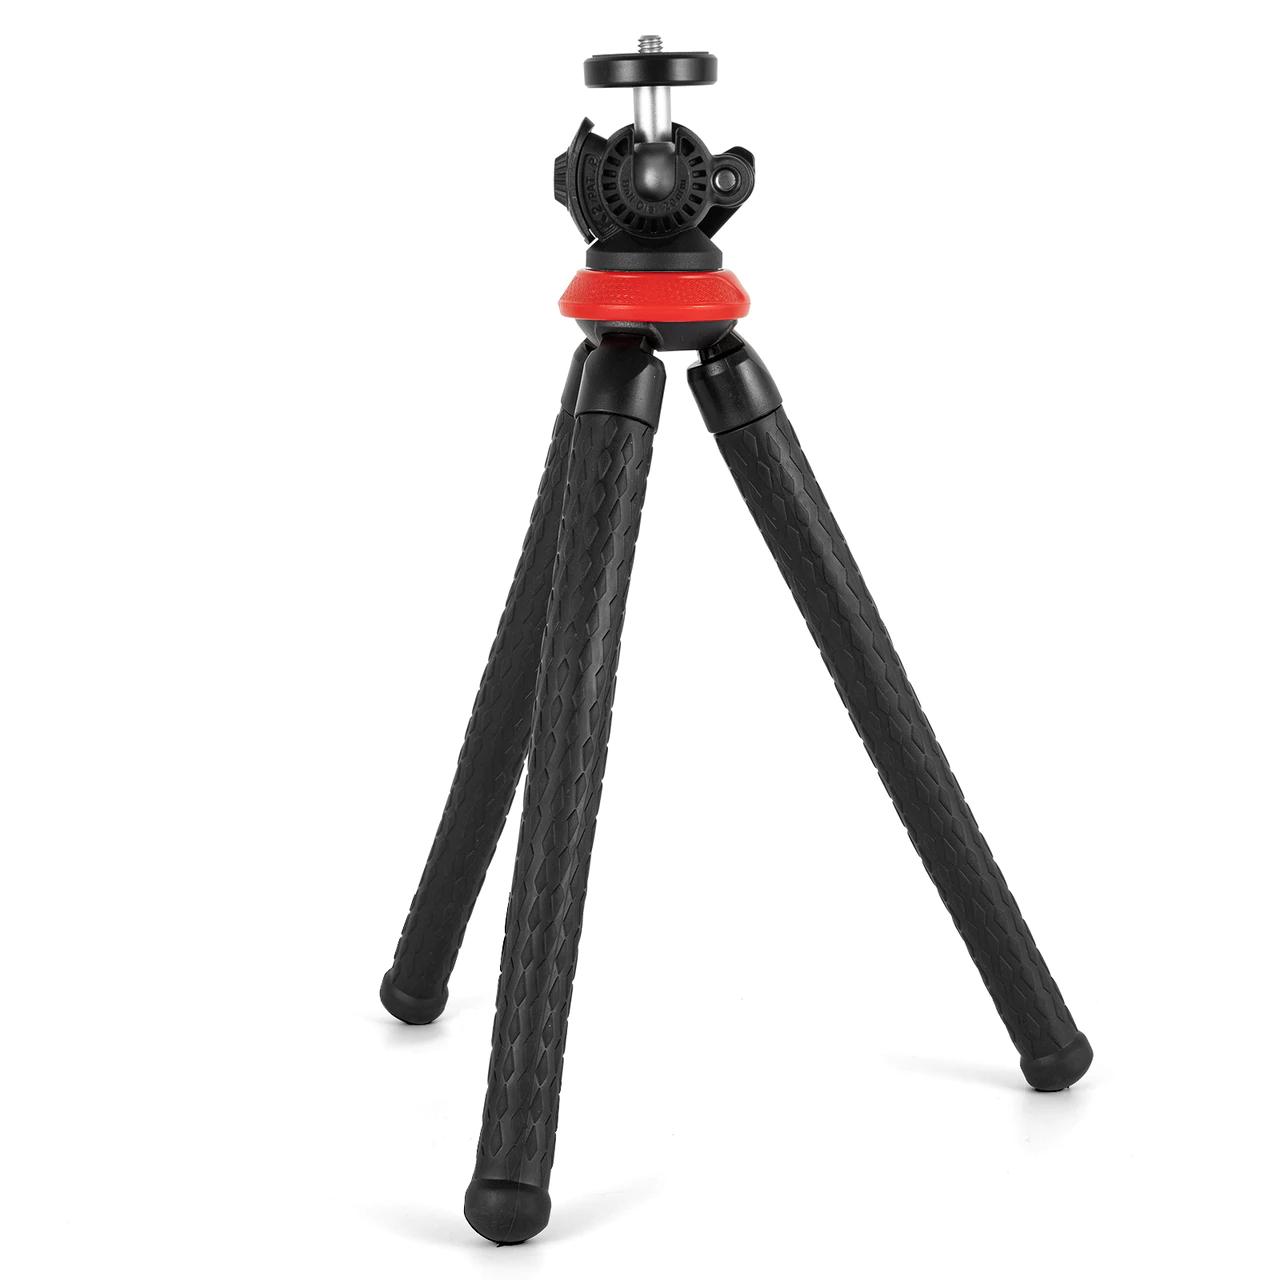 smallrig-3255-dt-03-flexible-tripod-gi%C4%99tki-statyw-01.jpg